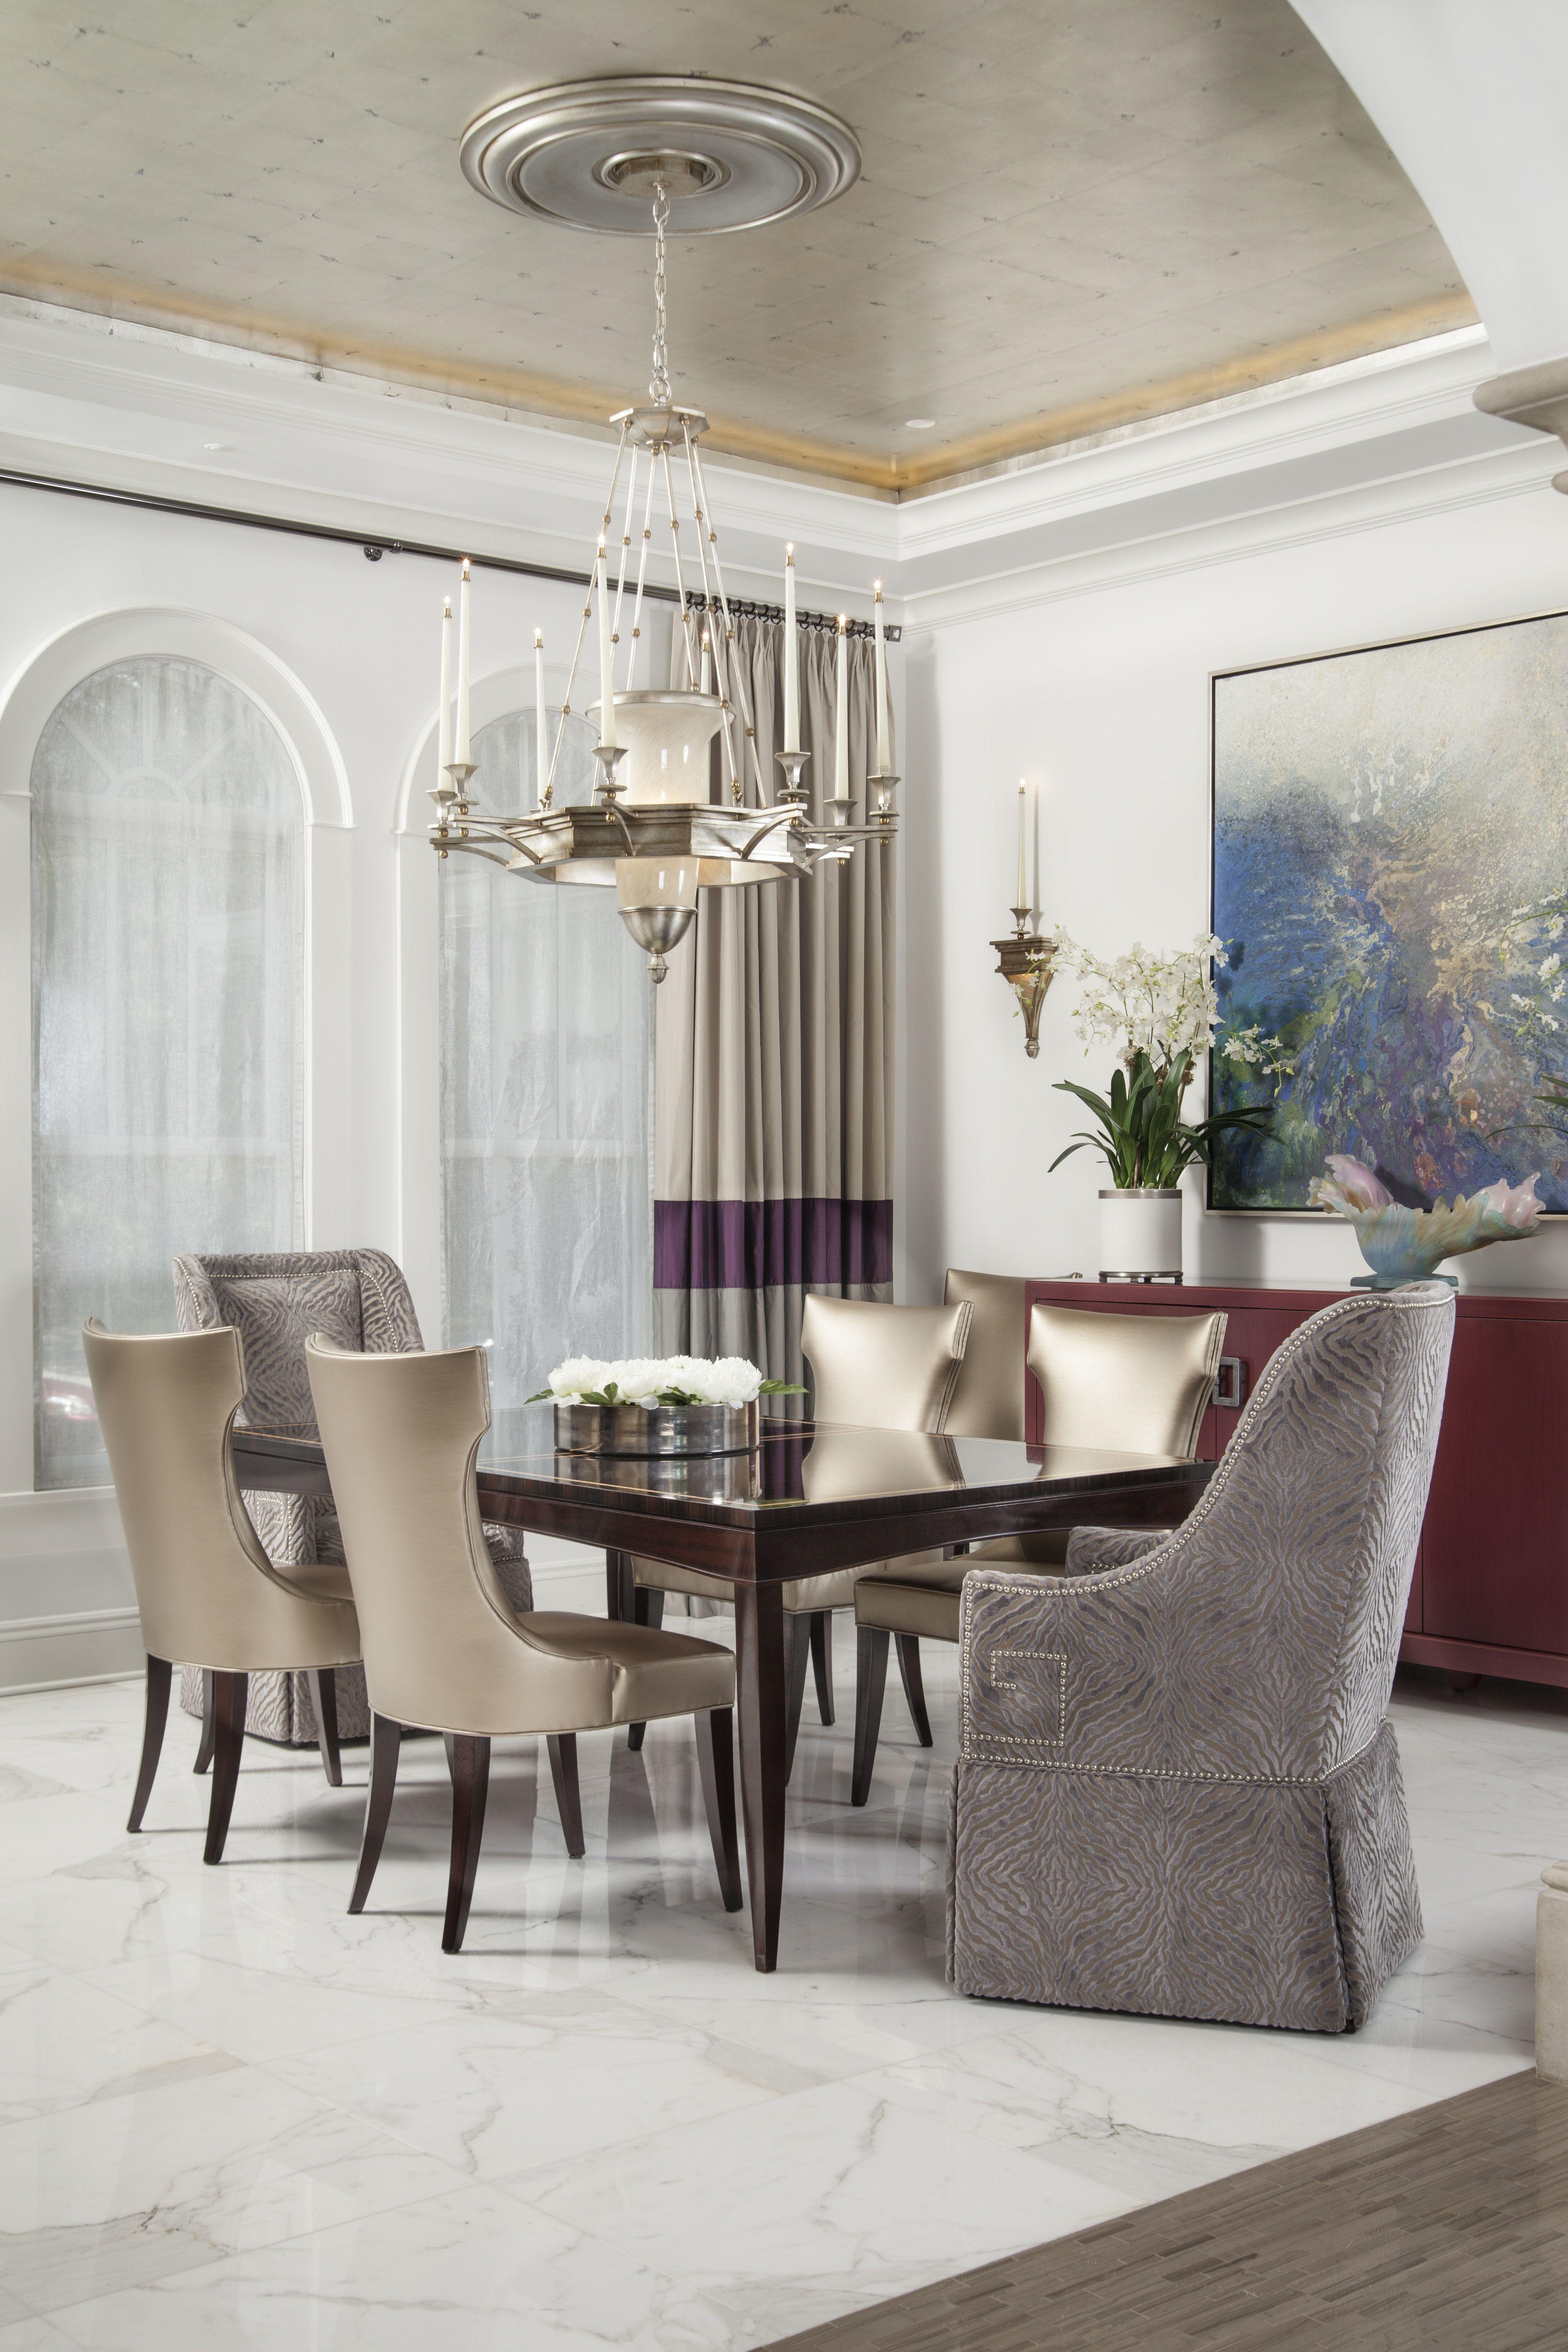 Davis Island Residence, Formal Dining room with metallic